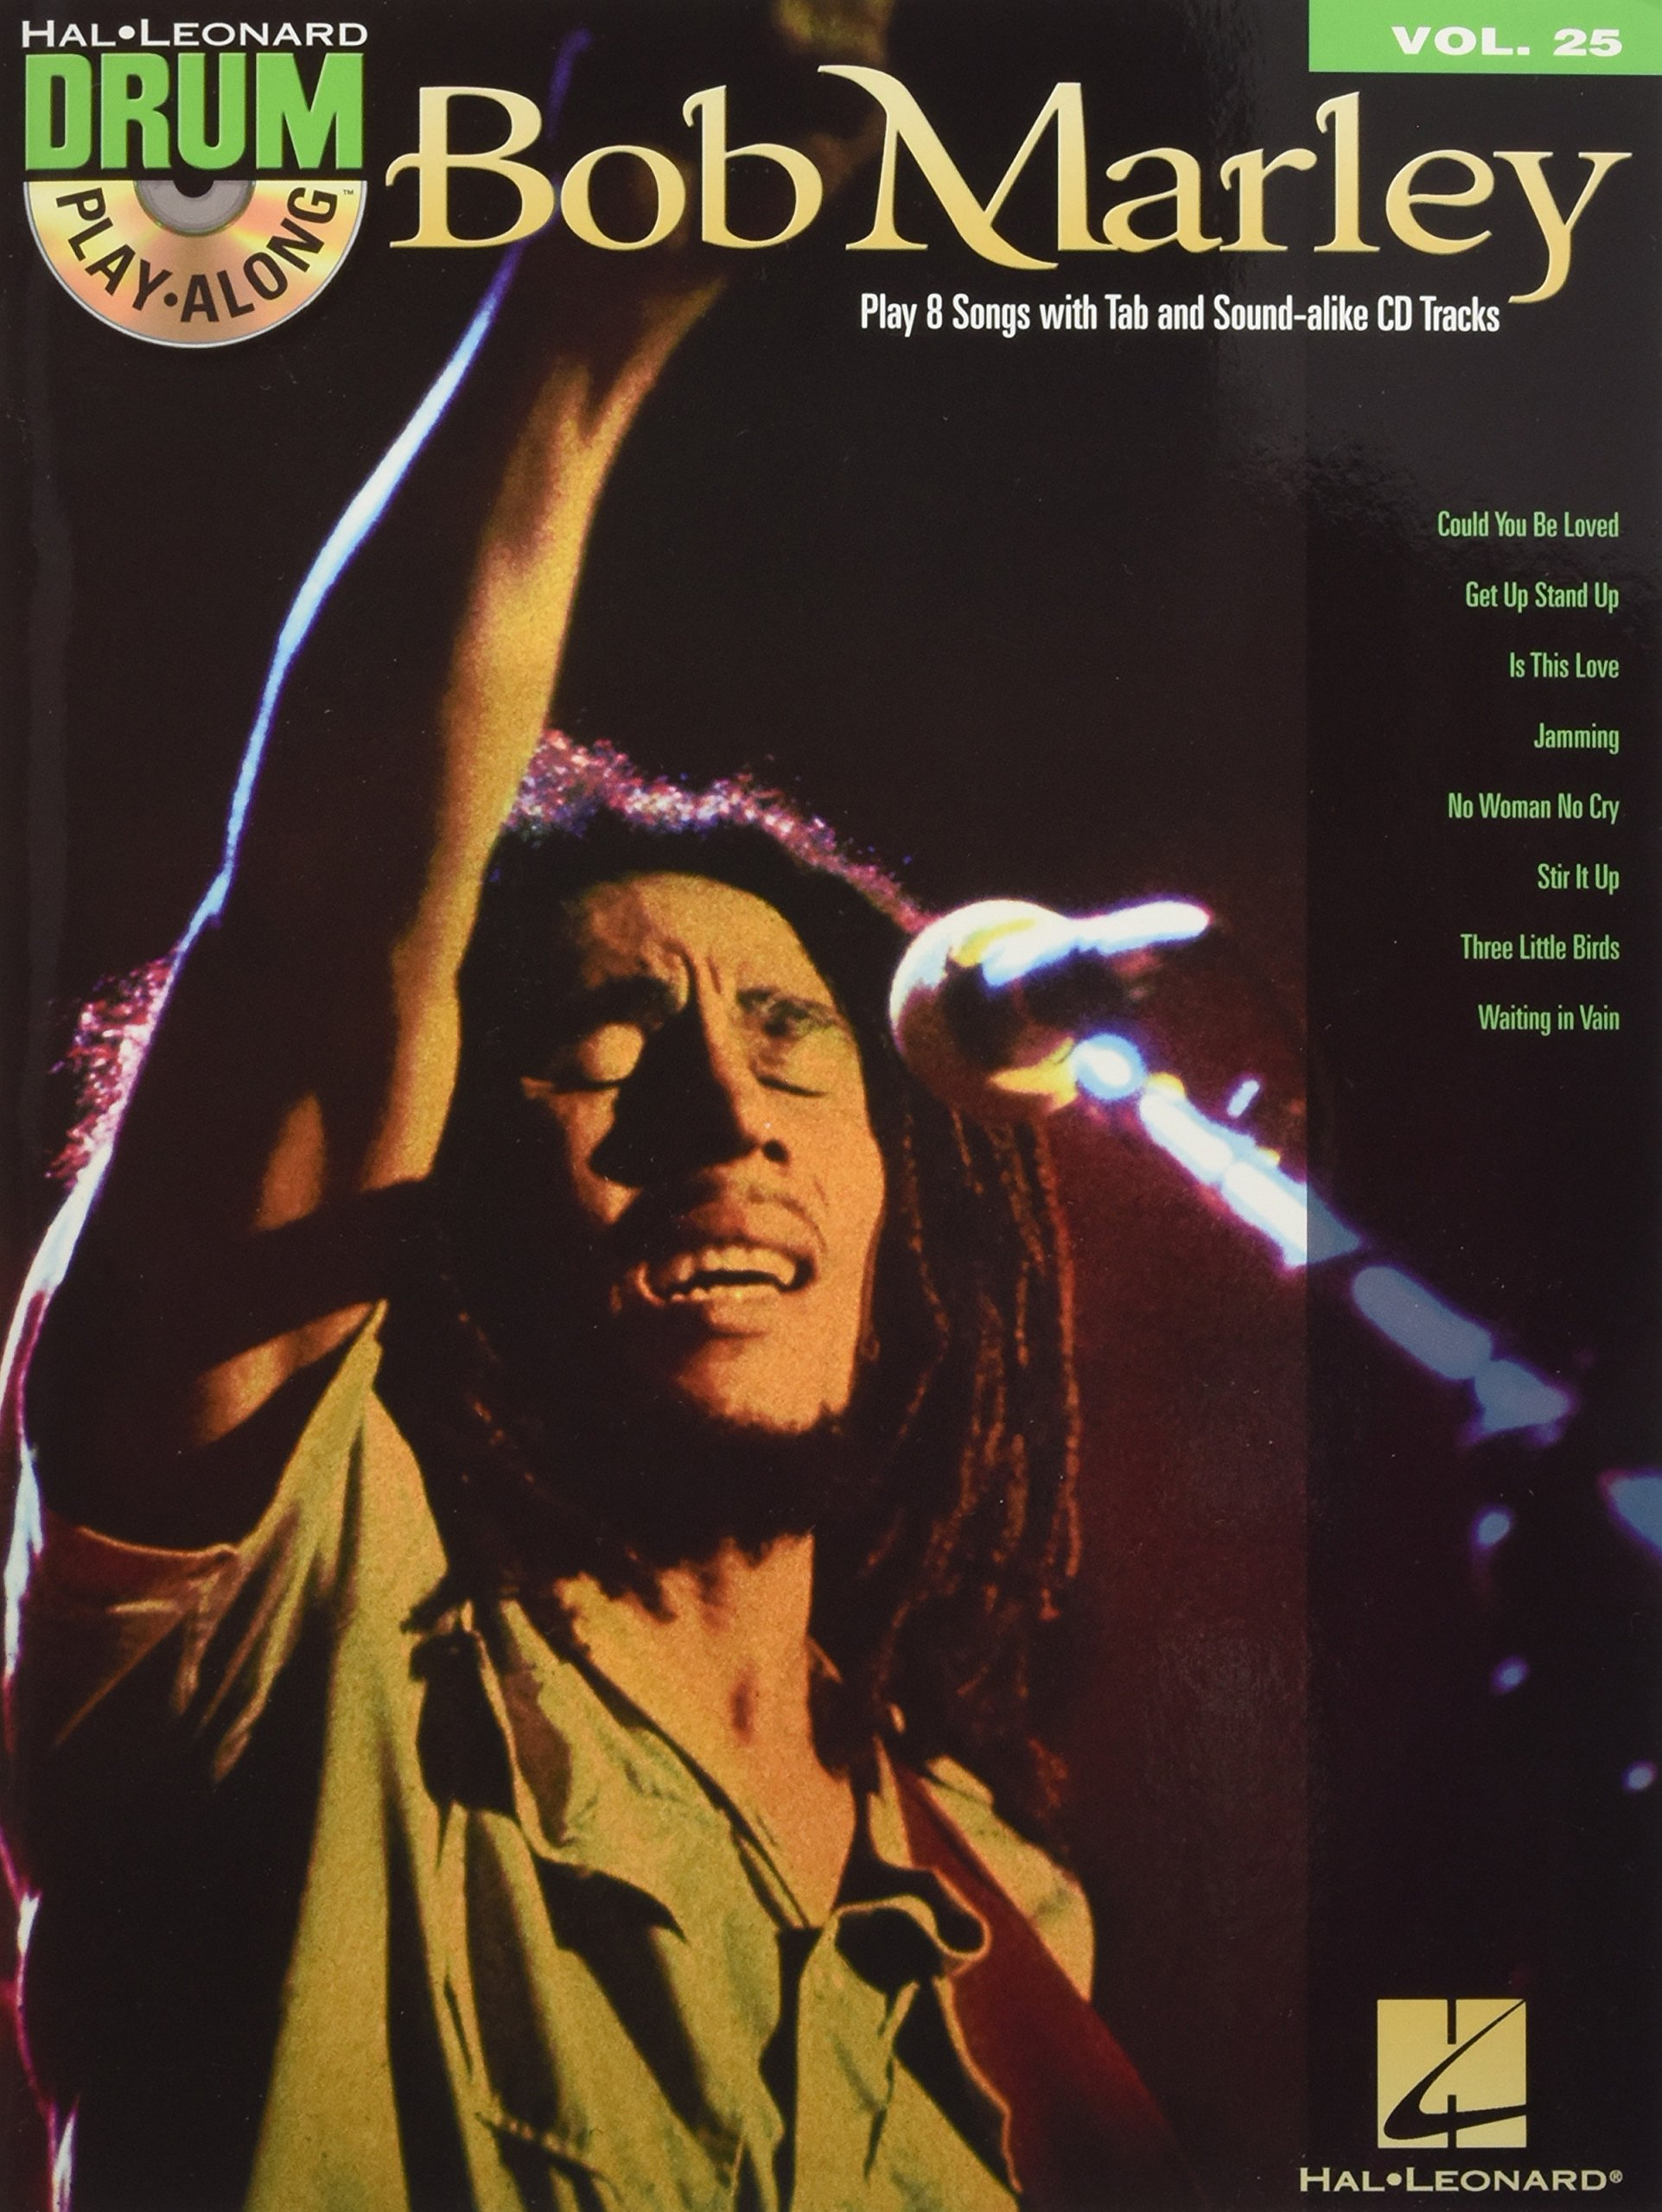 Bob Marley - Drum Play-Along Volume 25 (Book/Cd) (Hal Leonard Drum Play-along)